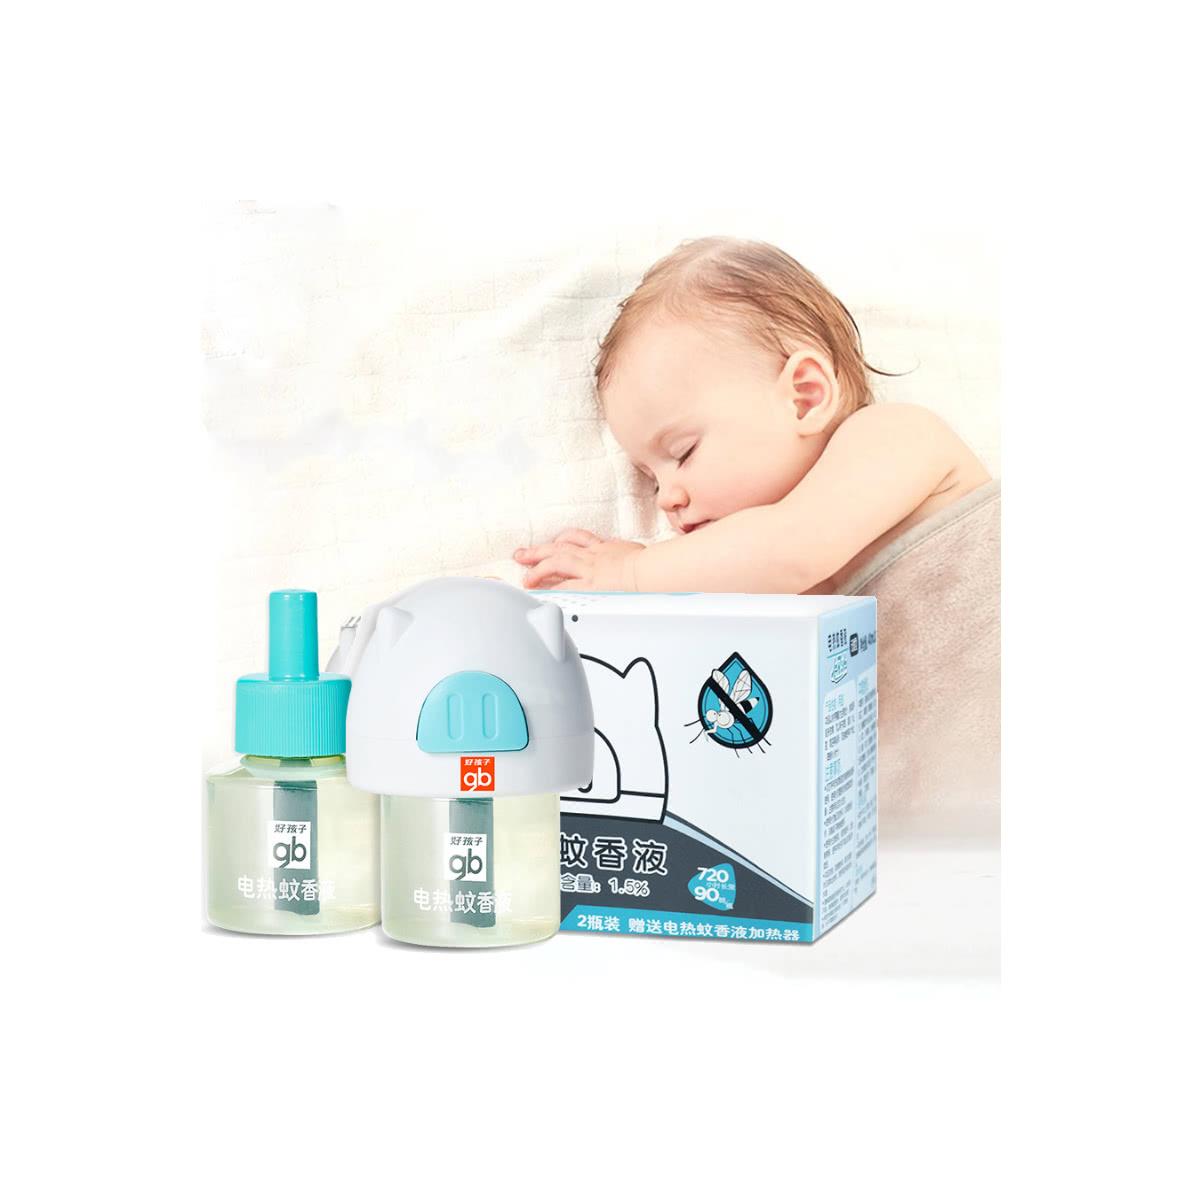 GoodBaby好孩子 新生婴儿电热蚊香液套装 宝宝球形驱蚊器电蚊香液驱蚊水